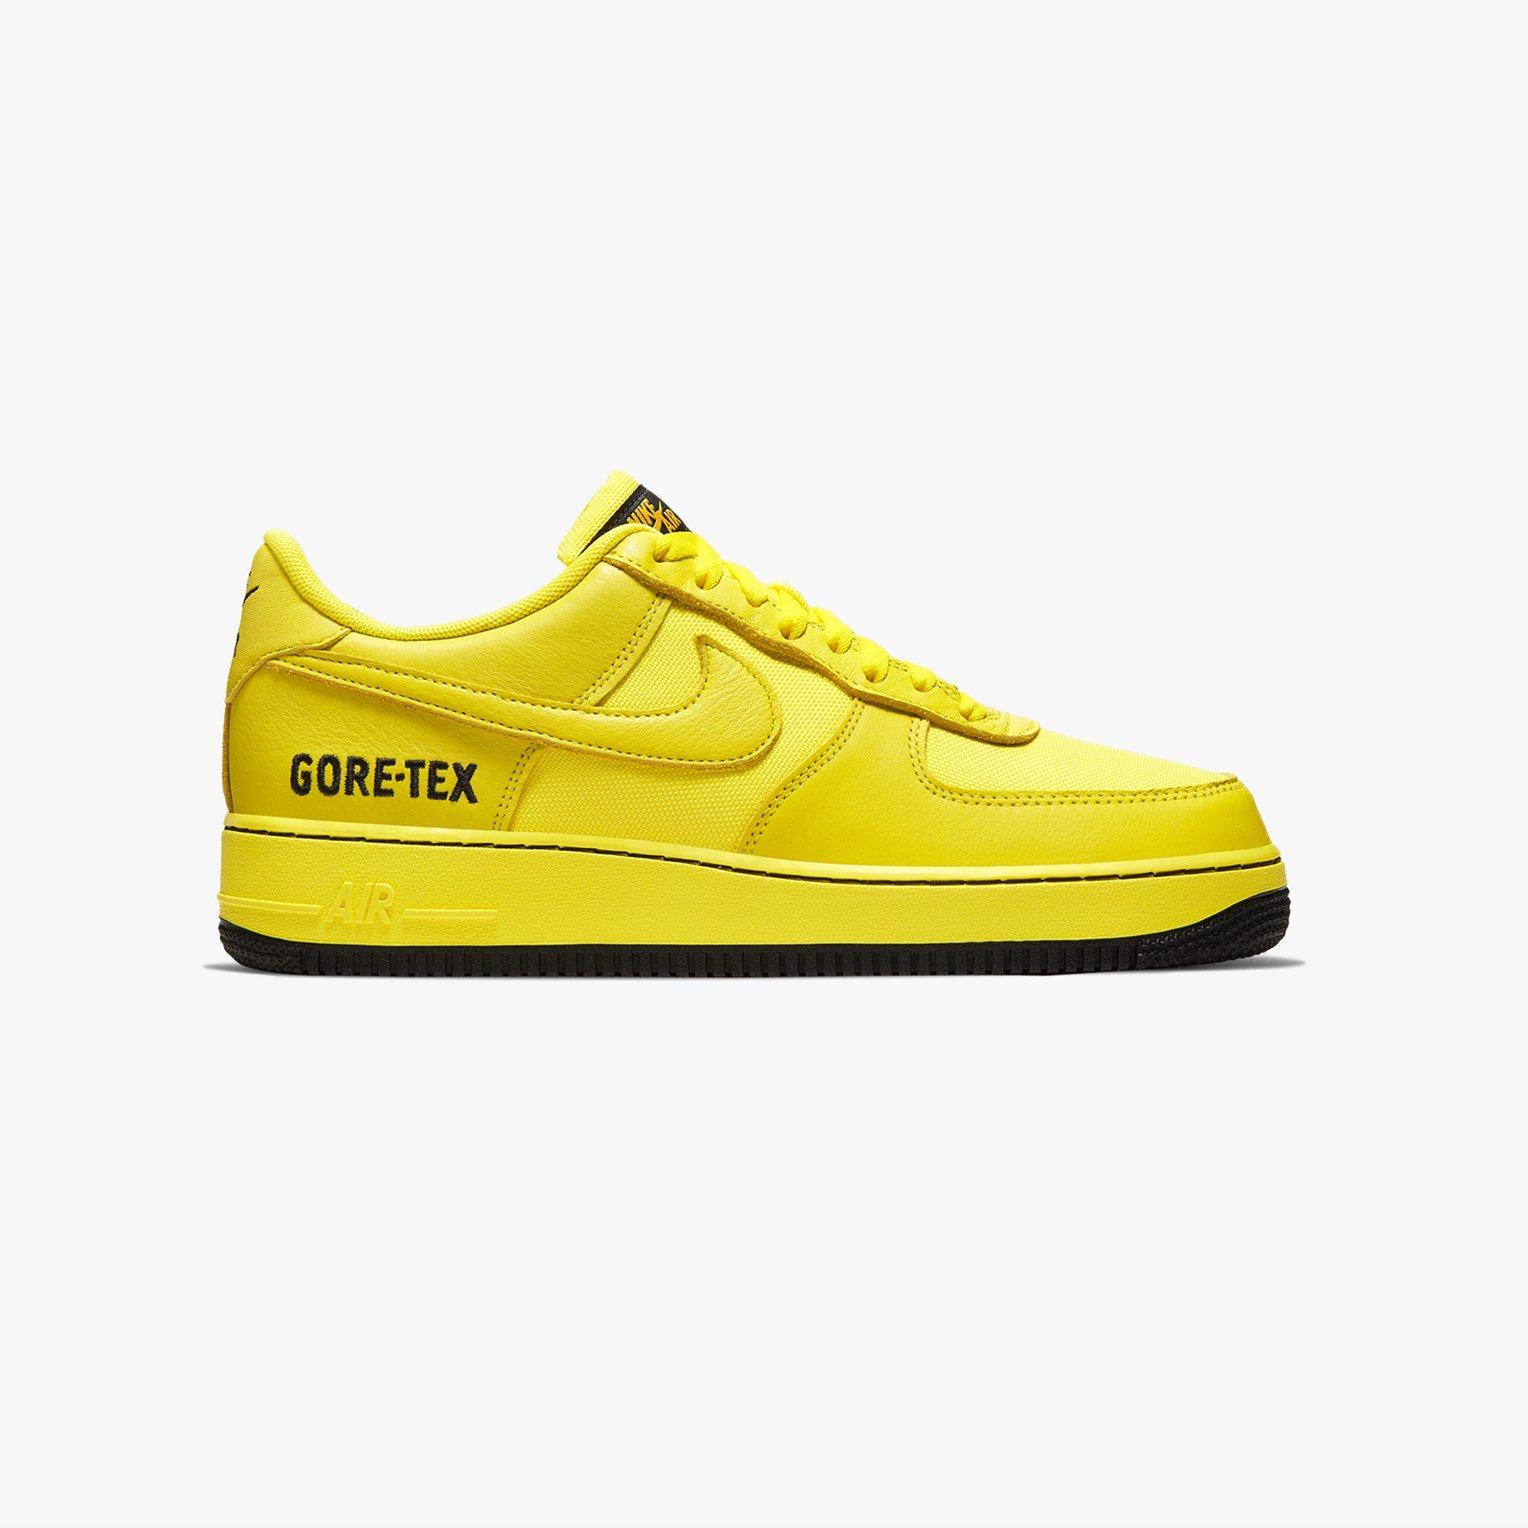 Nike 耐克 Air Force 1 GTX 运动鞋